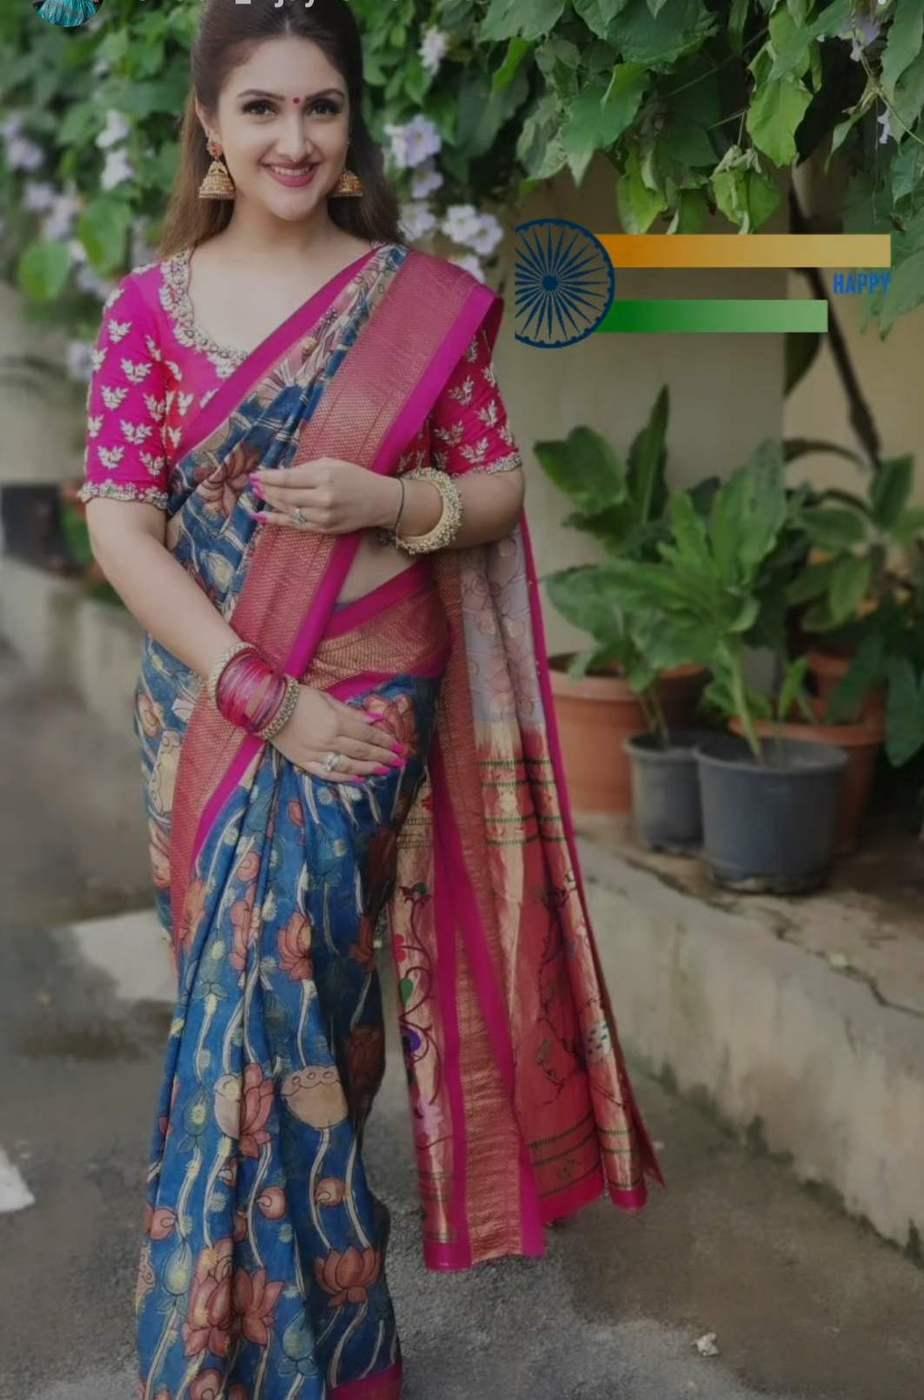 Sridevi vijaykumar in a indigo brand mandir saree for comedy stars-2